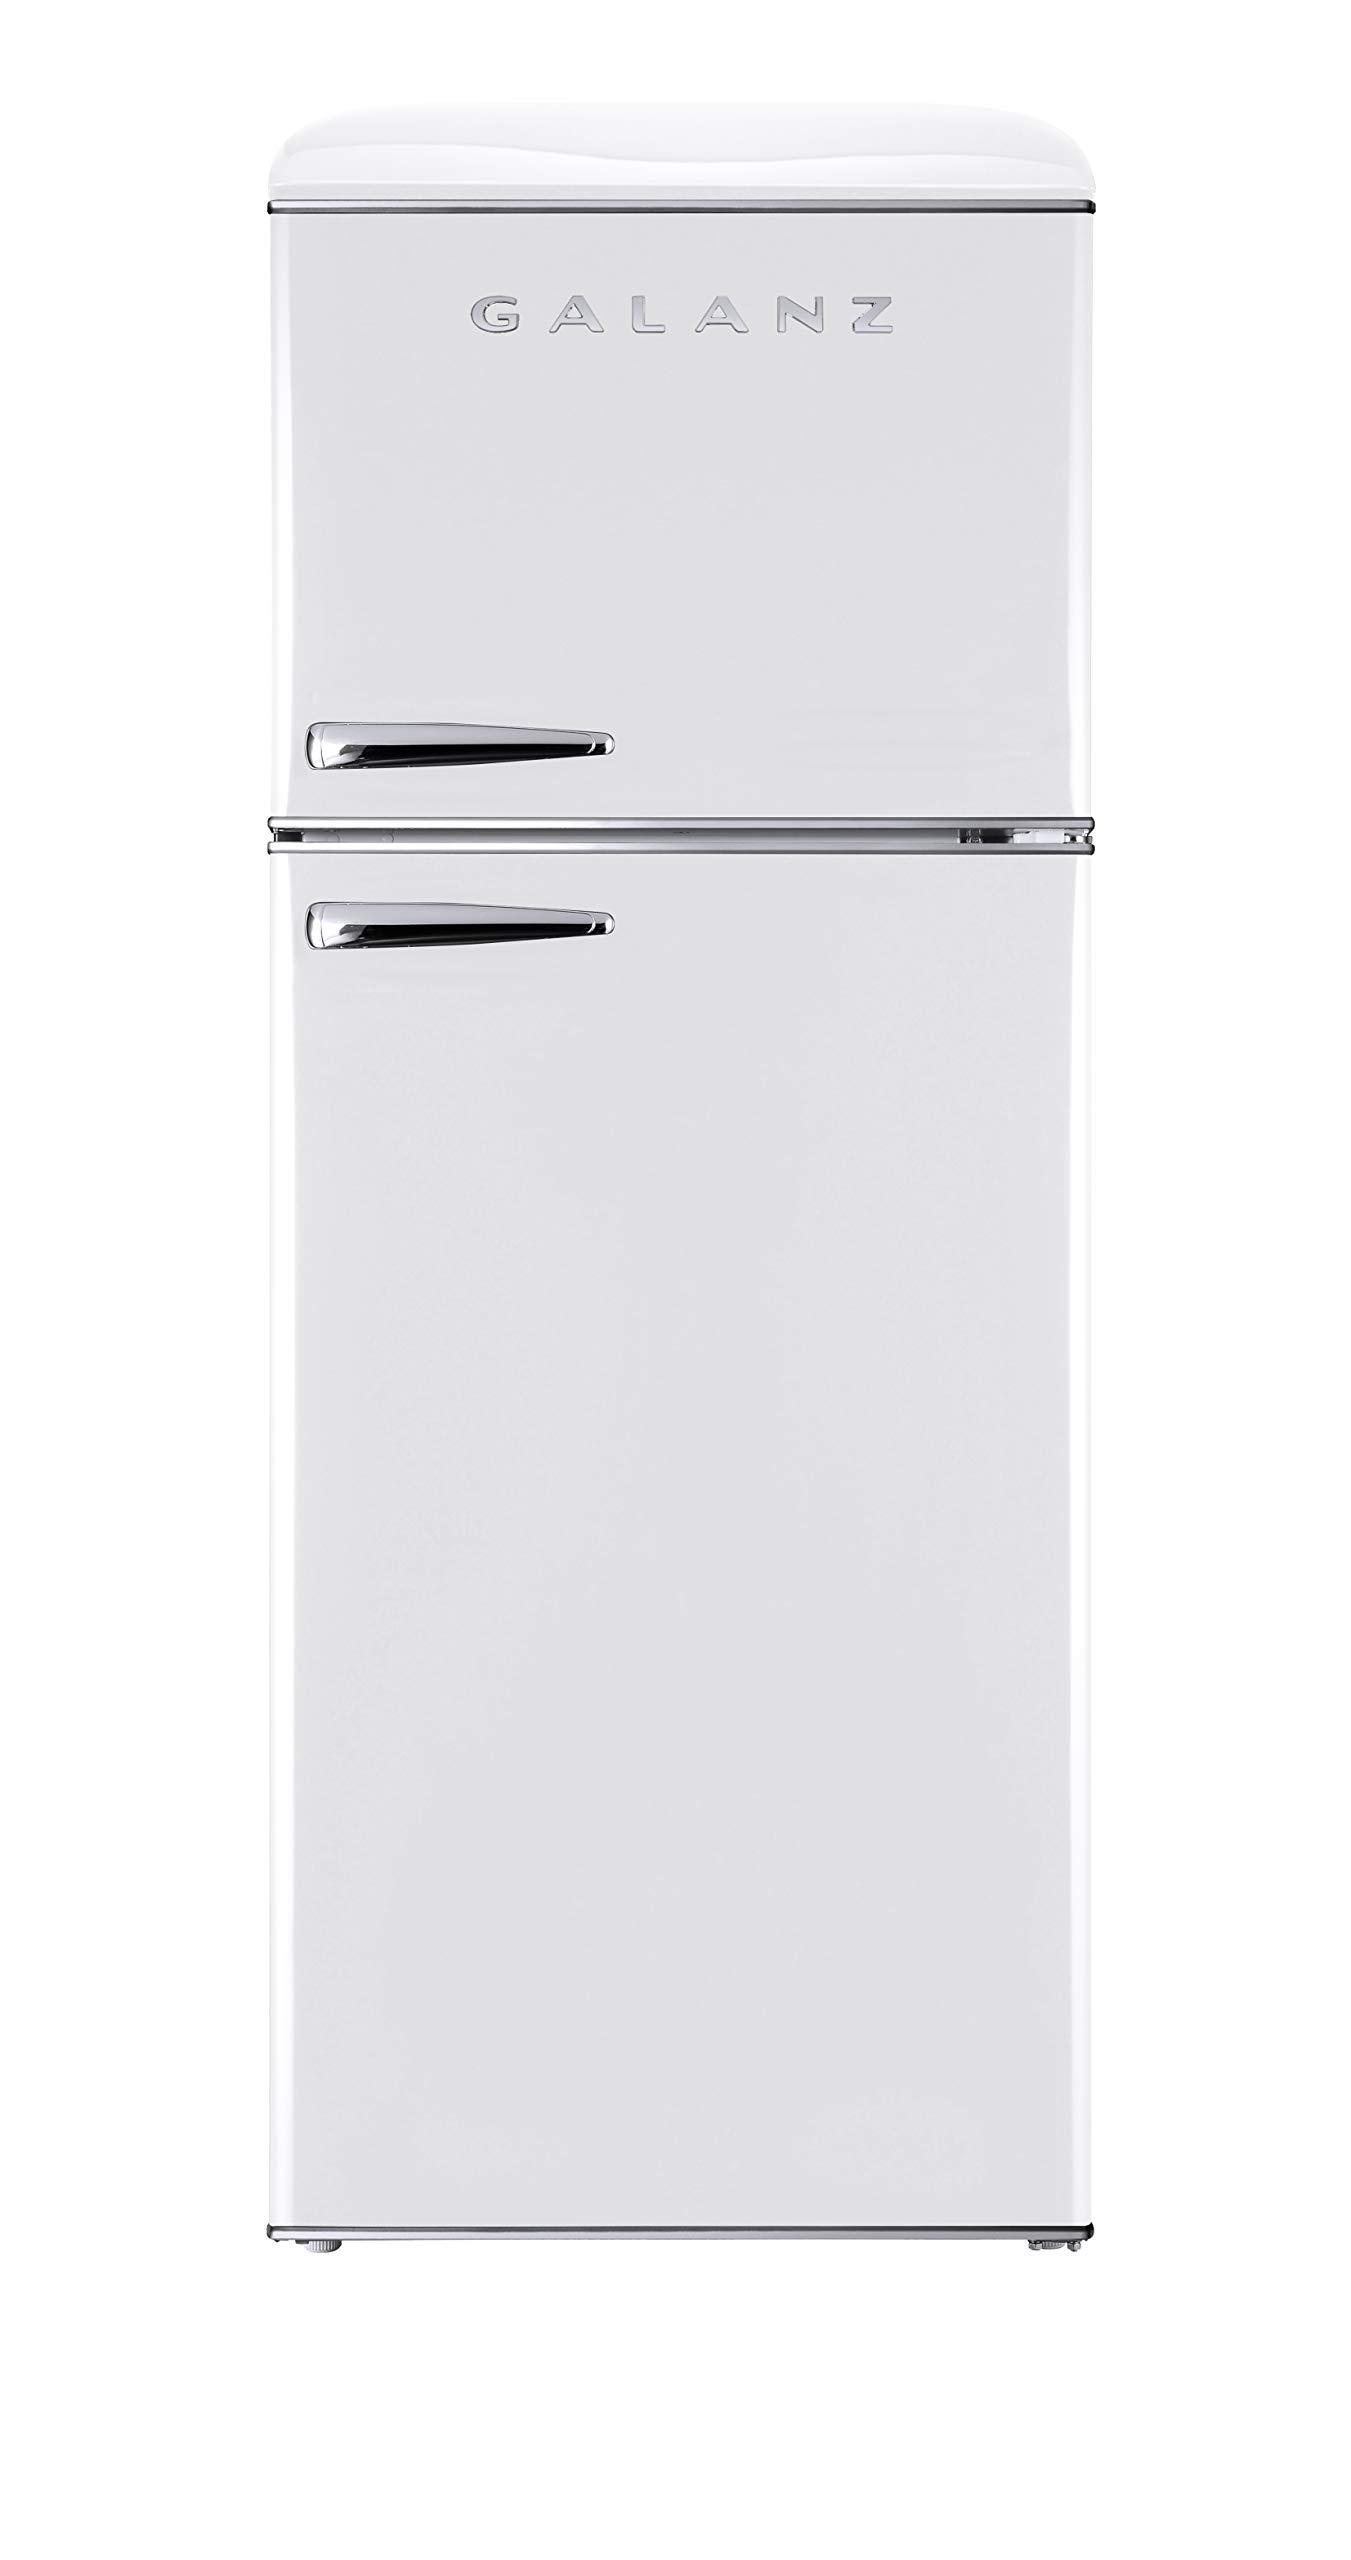 Galanz GLR12TWEEFR Retro Top Mount Refrigerator, 12.0 Cu Ft, White